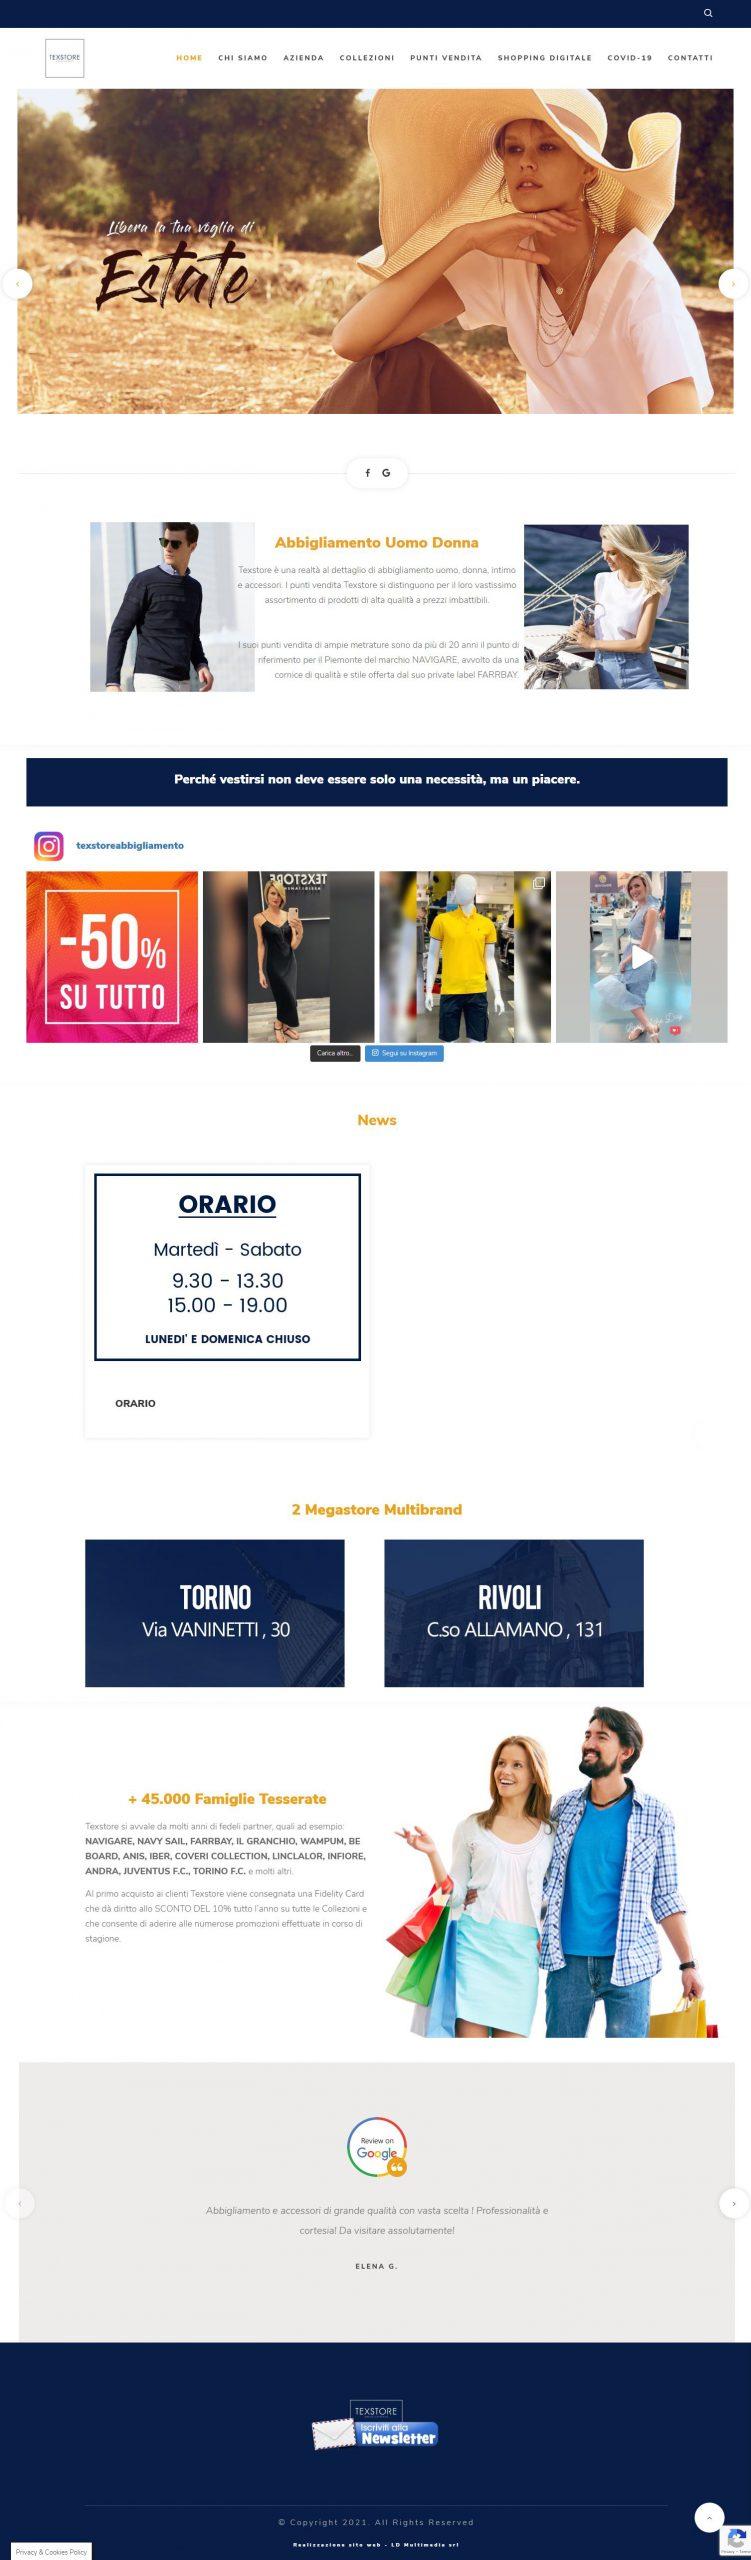 Texstore Homepage